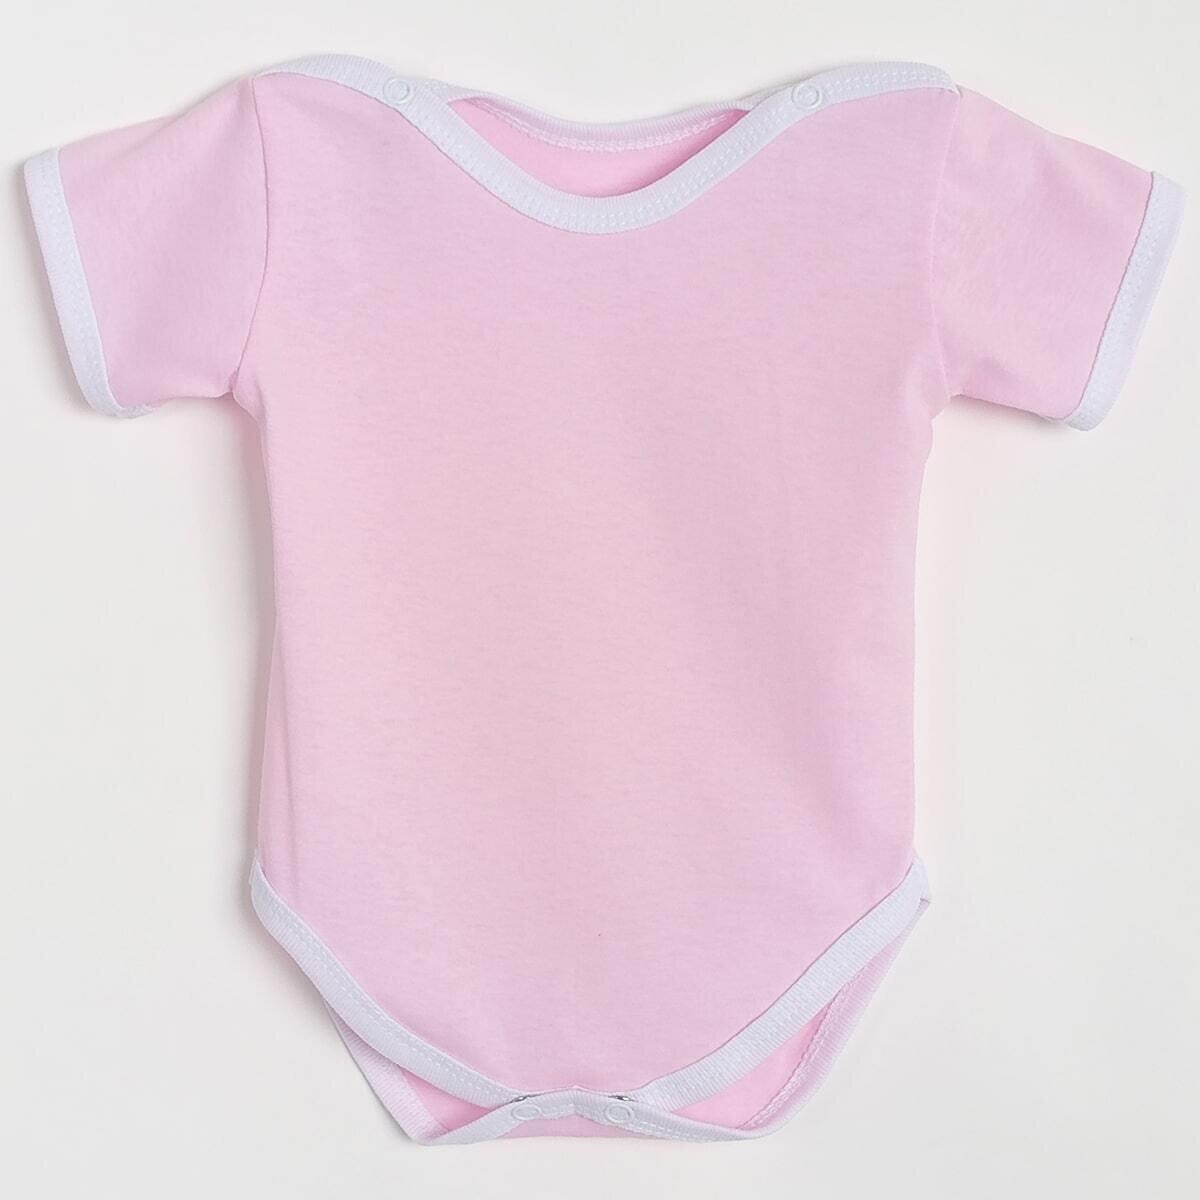 Боди Утёнок, тонкий трикотаж, розовый